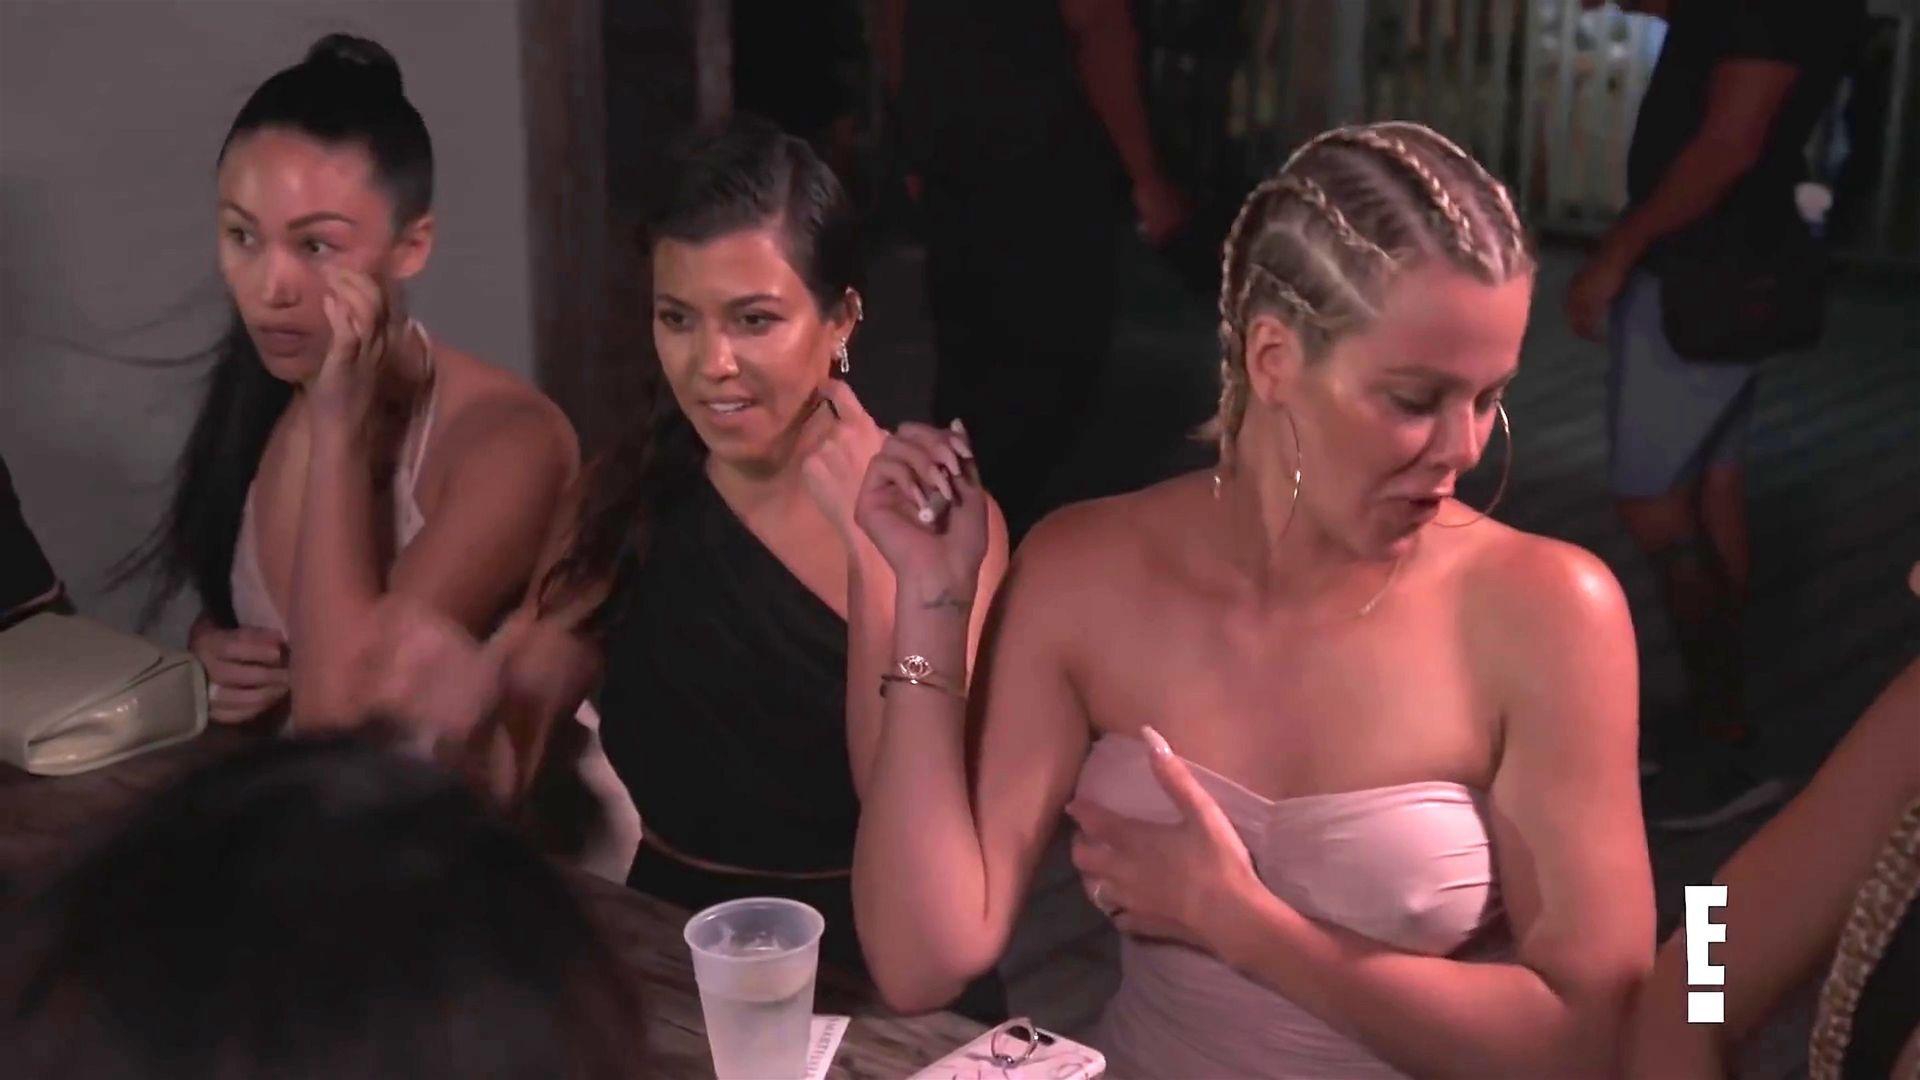 Khloé Kardashian Gets A Little Cold Without A Bra 0015